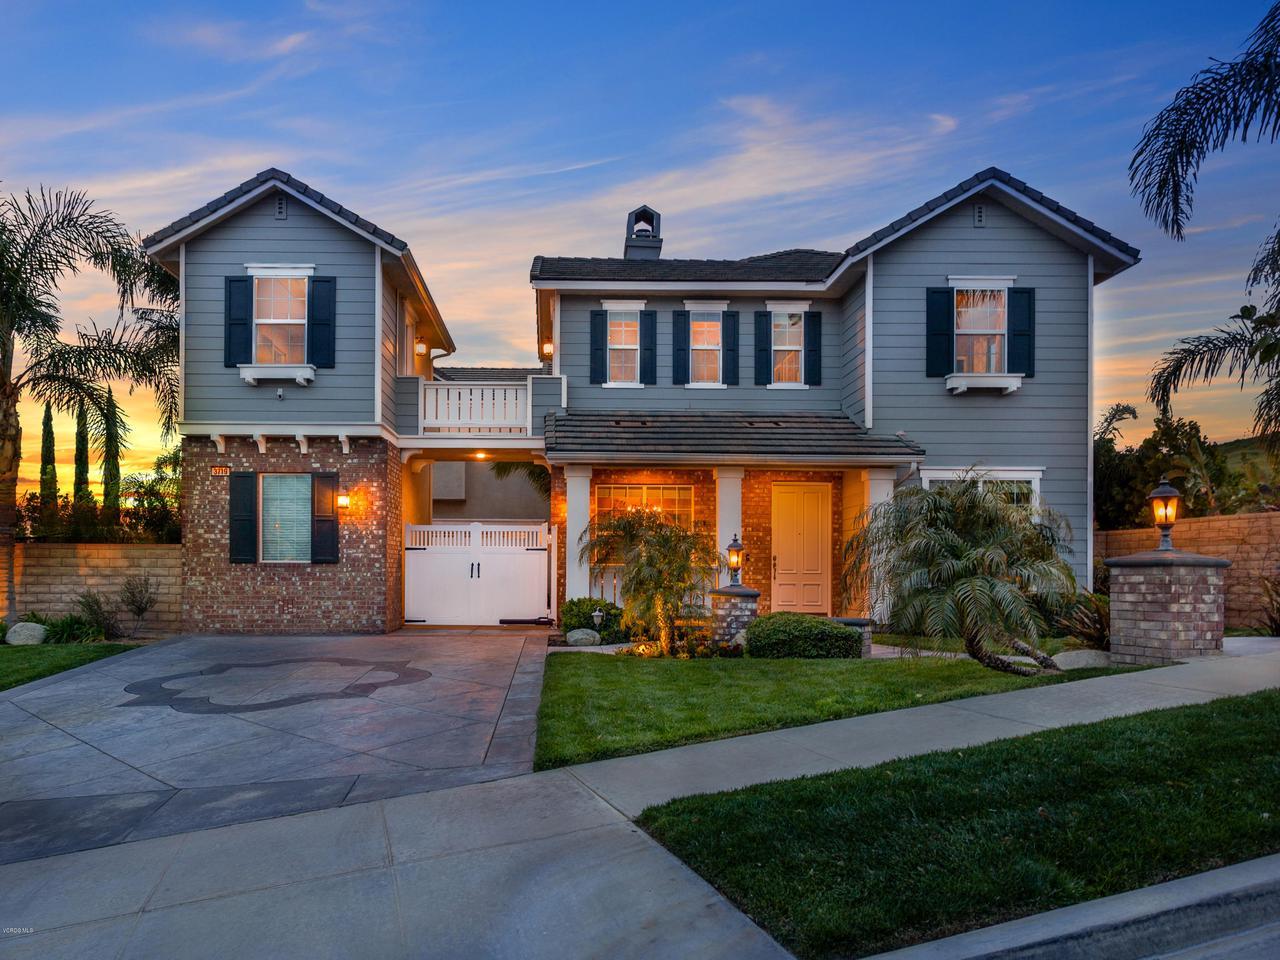 Photo of 3719 MANDOLIN AVENUE, Simi Valley, CA 93063